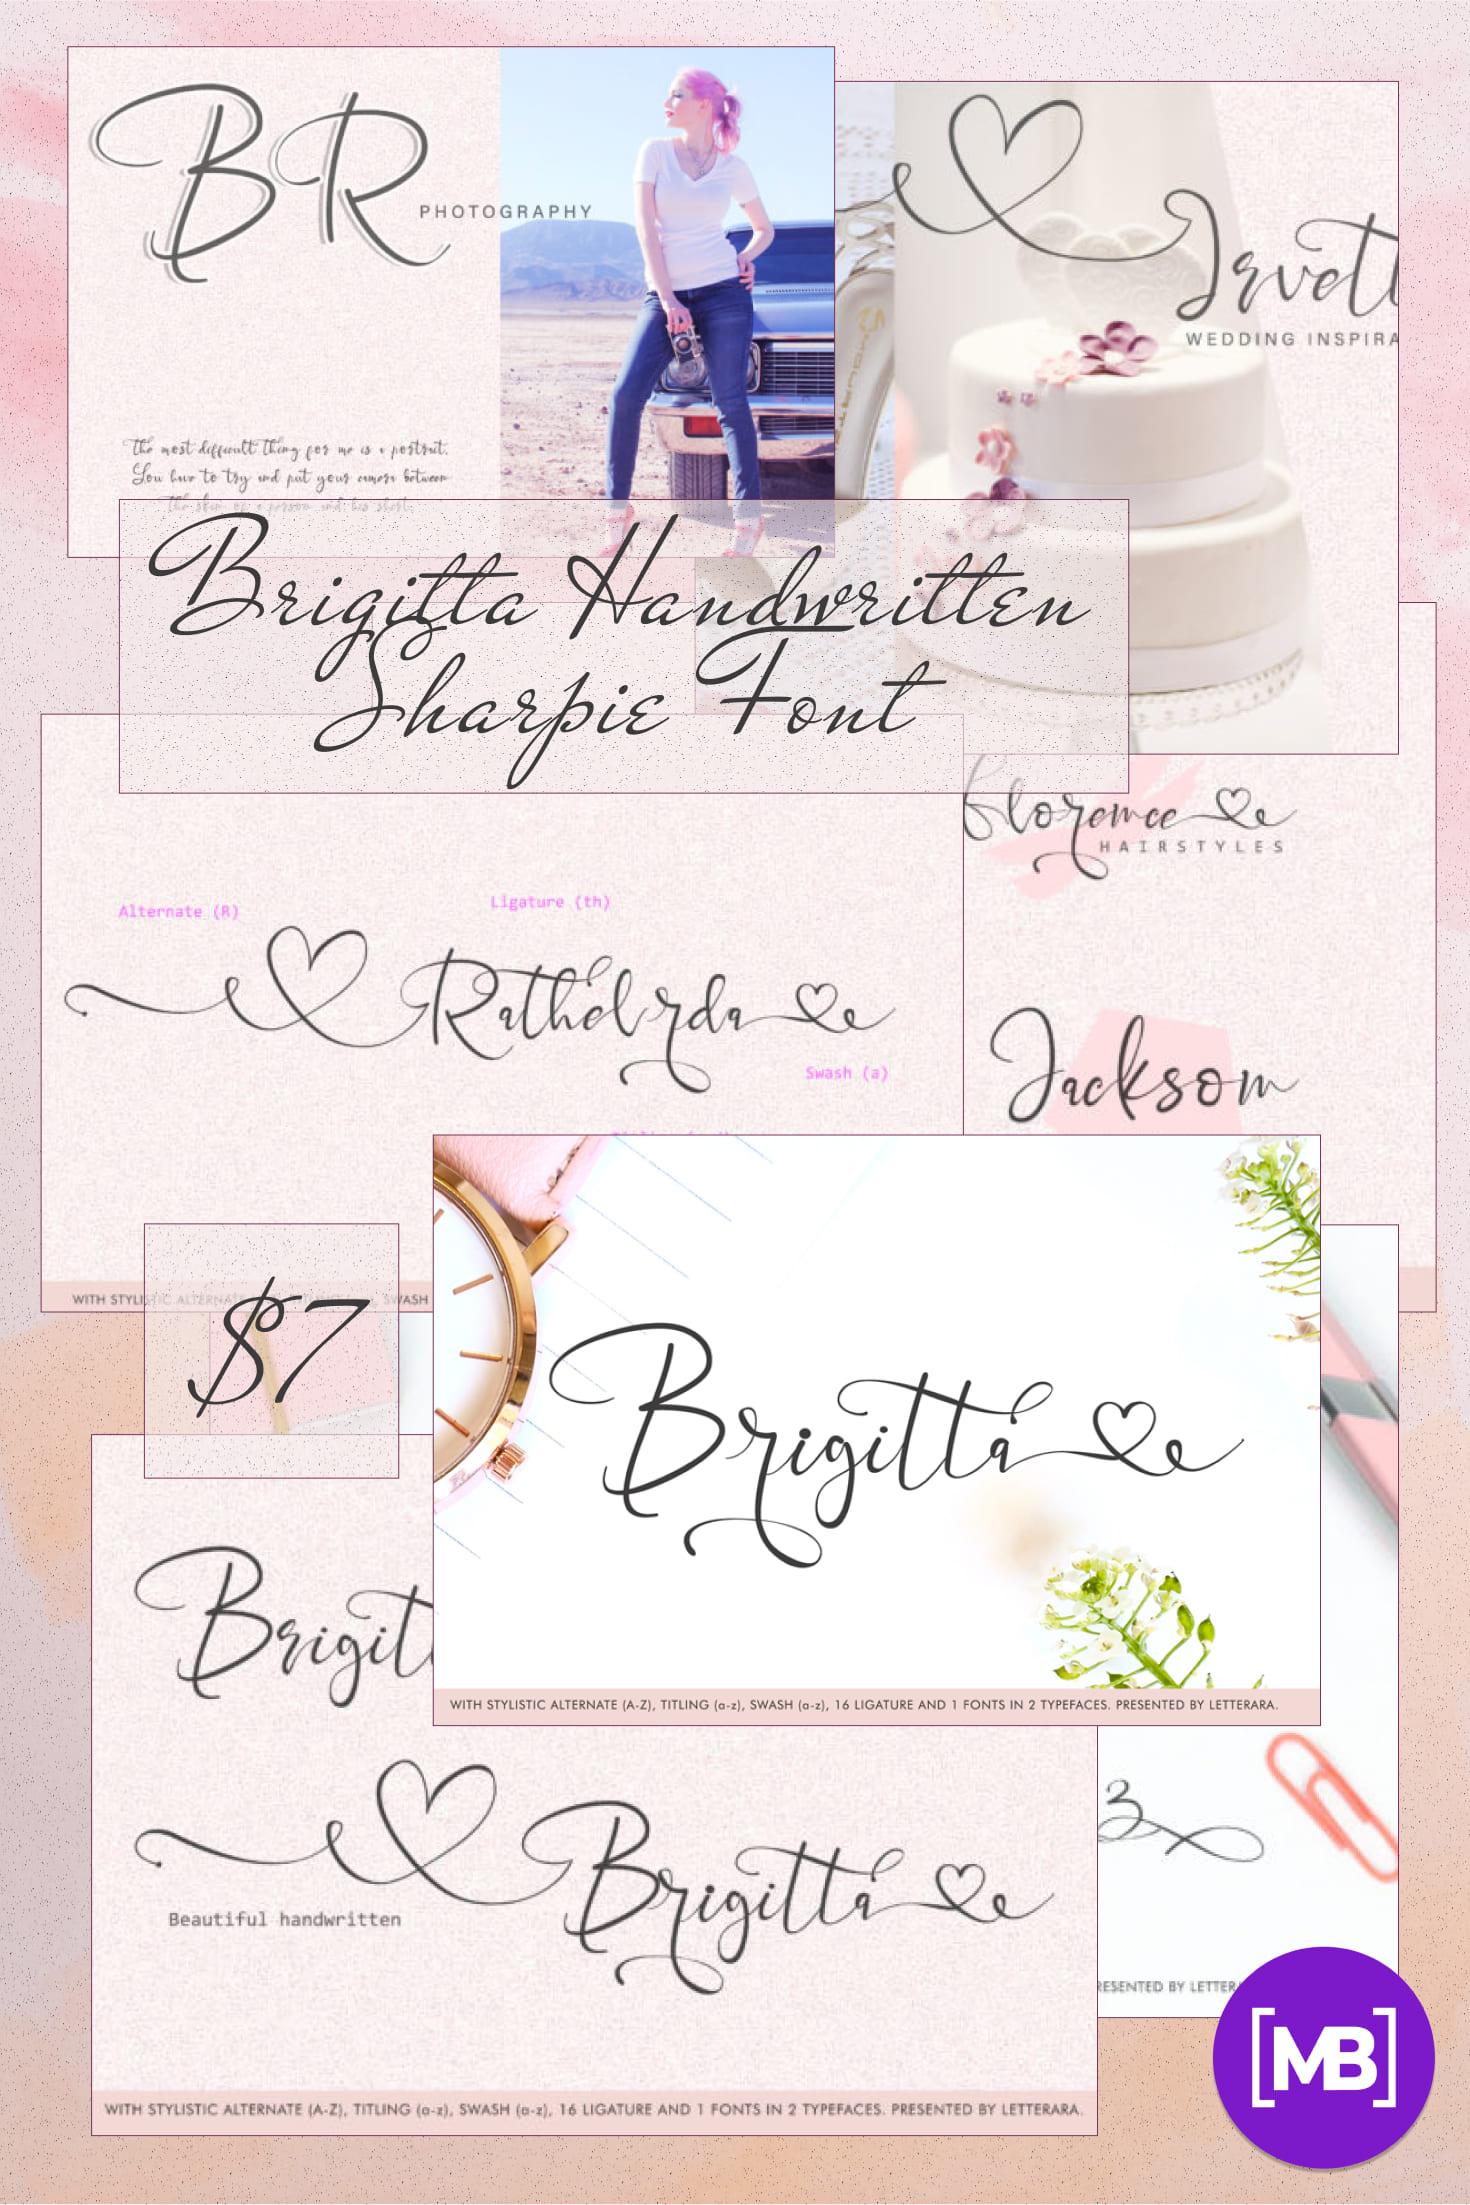 Pinterest Image: Best Handwritten Sharpie Font 2021 | Brigitta Handwritten Sharpie Font.